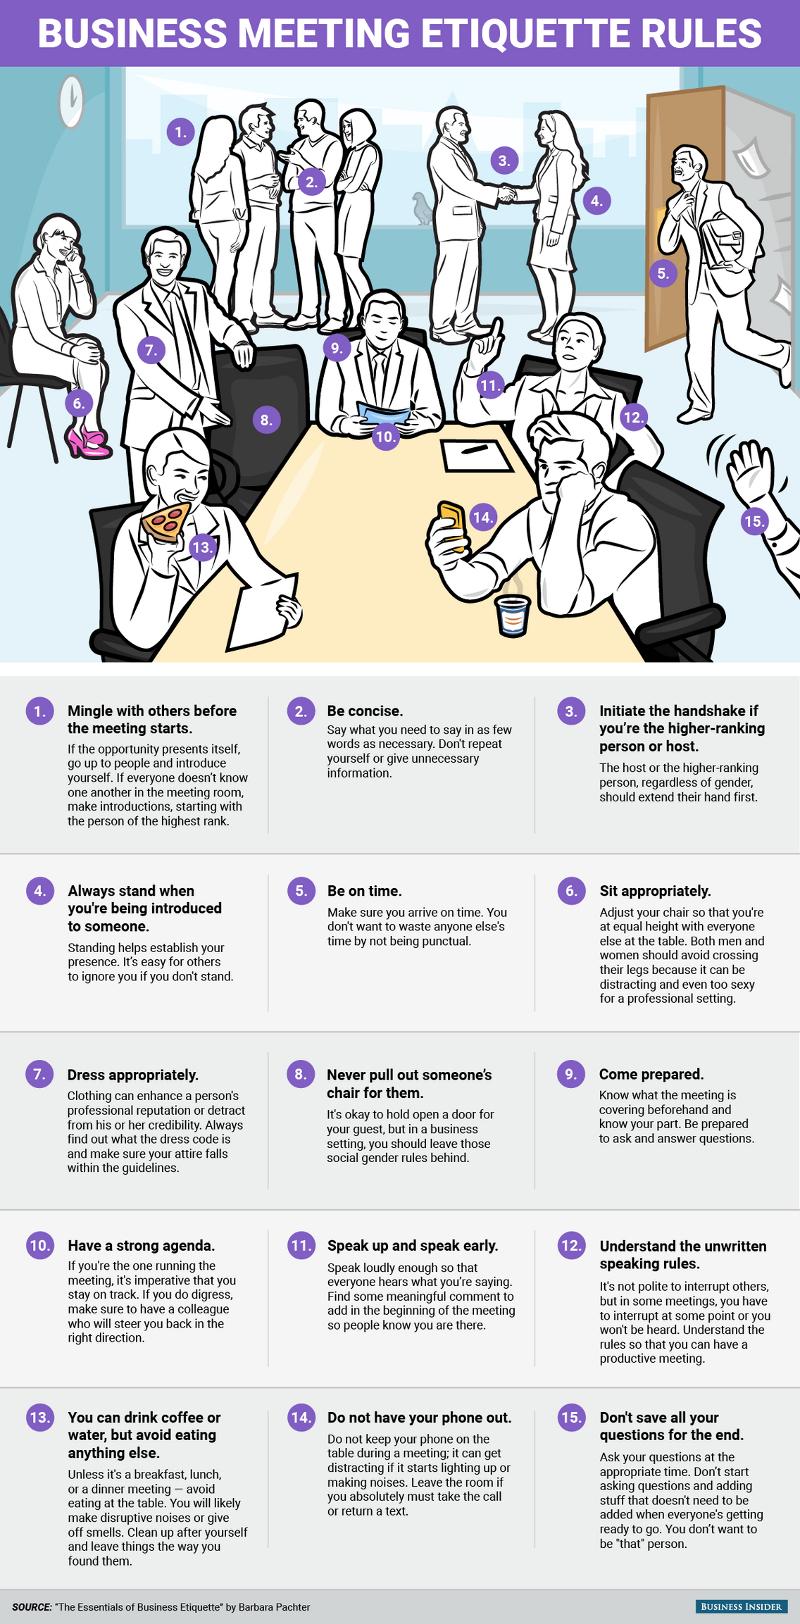 Business-Meeting-Etiquette